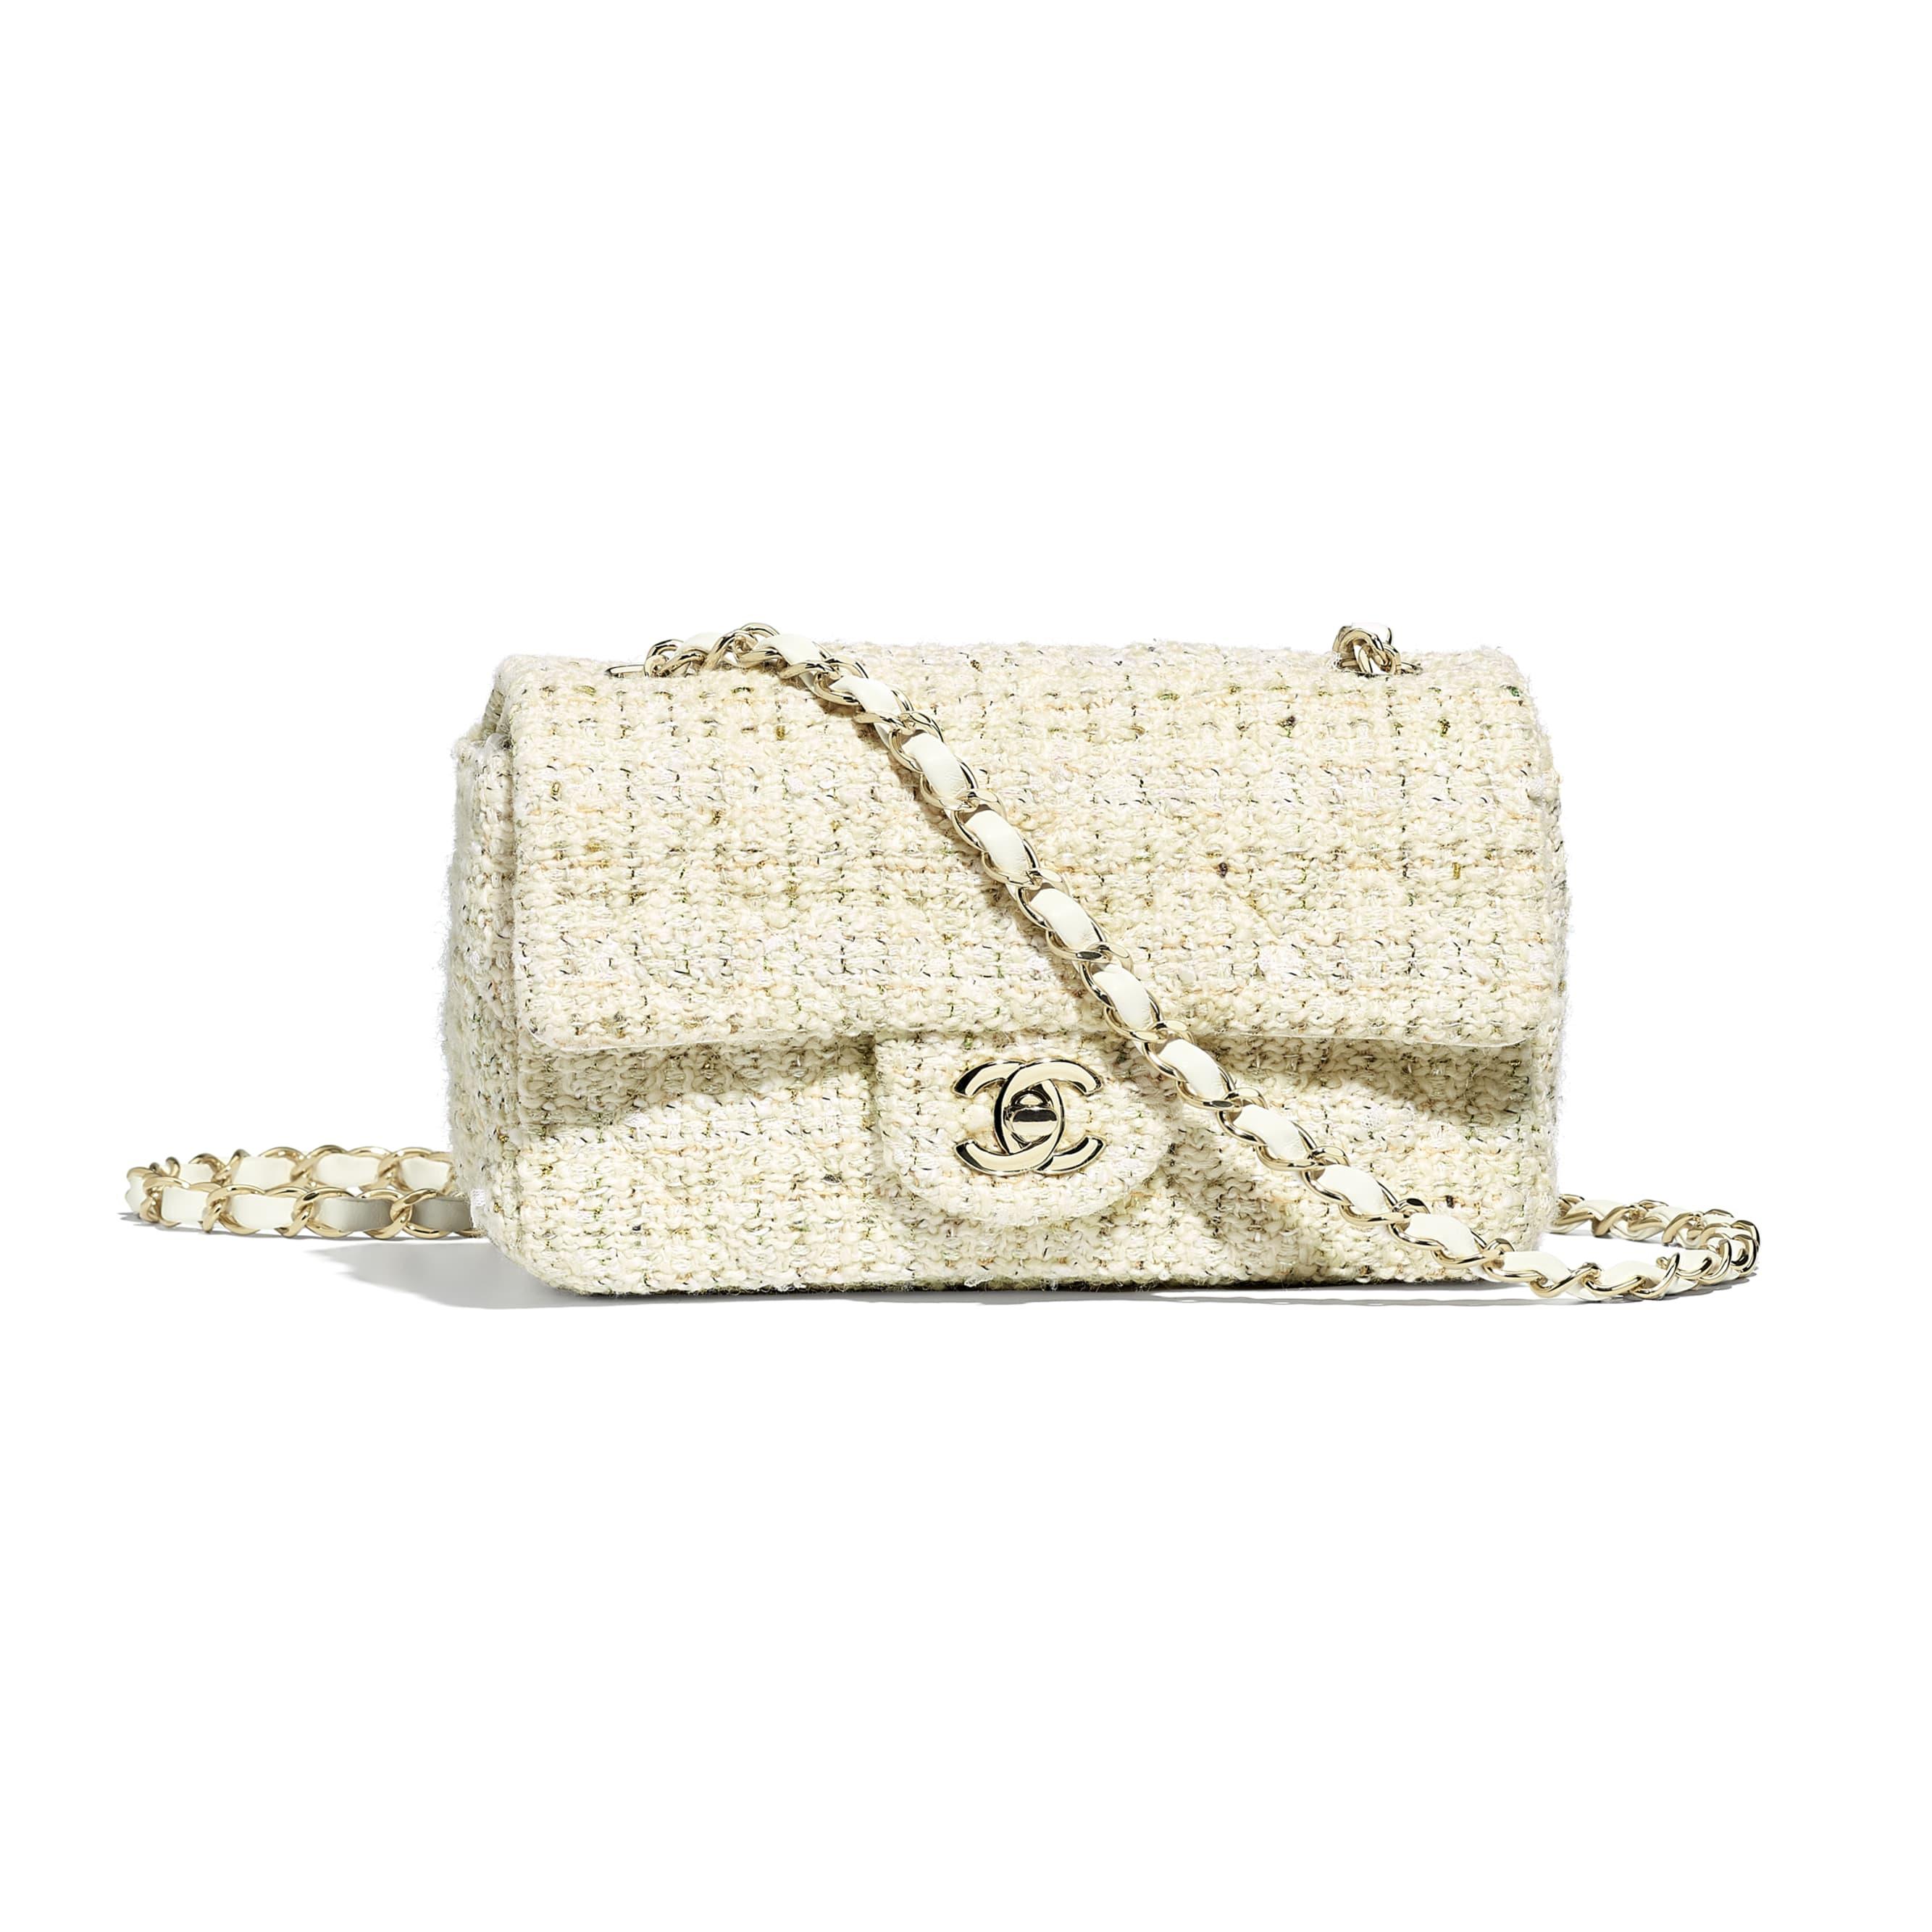 Mini Flap Bag - Ecru, white, green & gold - Tweed & Gold-Tone Metal - Default view - see standard sized version